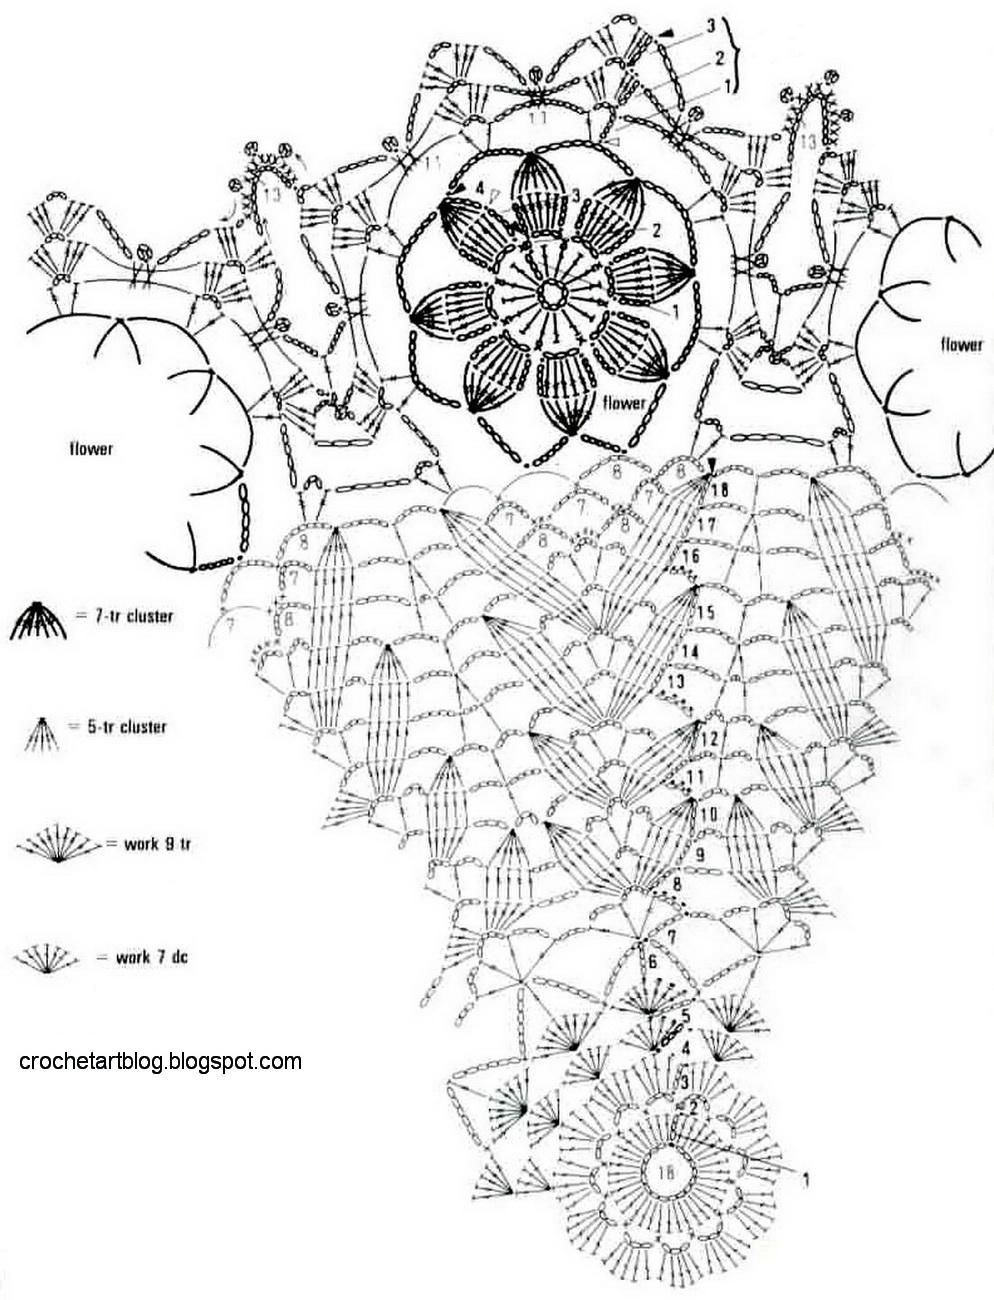 crochet art  crochet tablecloth pattern free